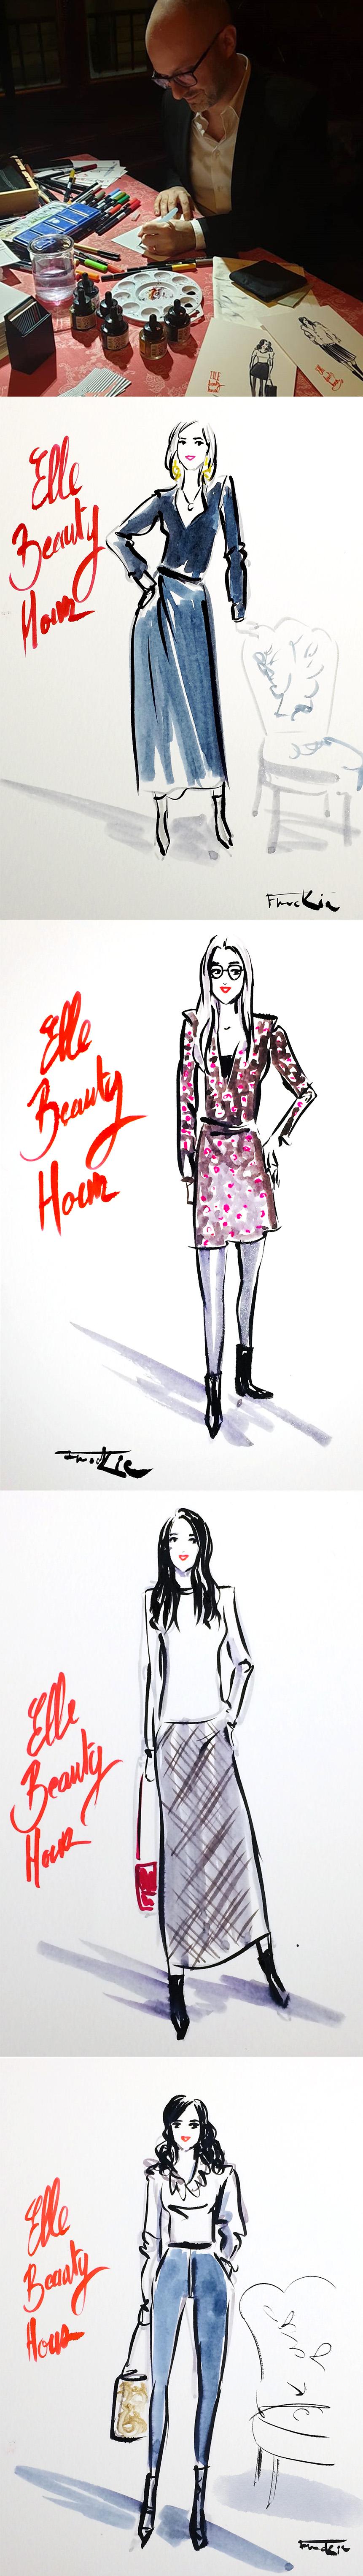 elle-beauty-hour-live-illustration